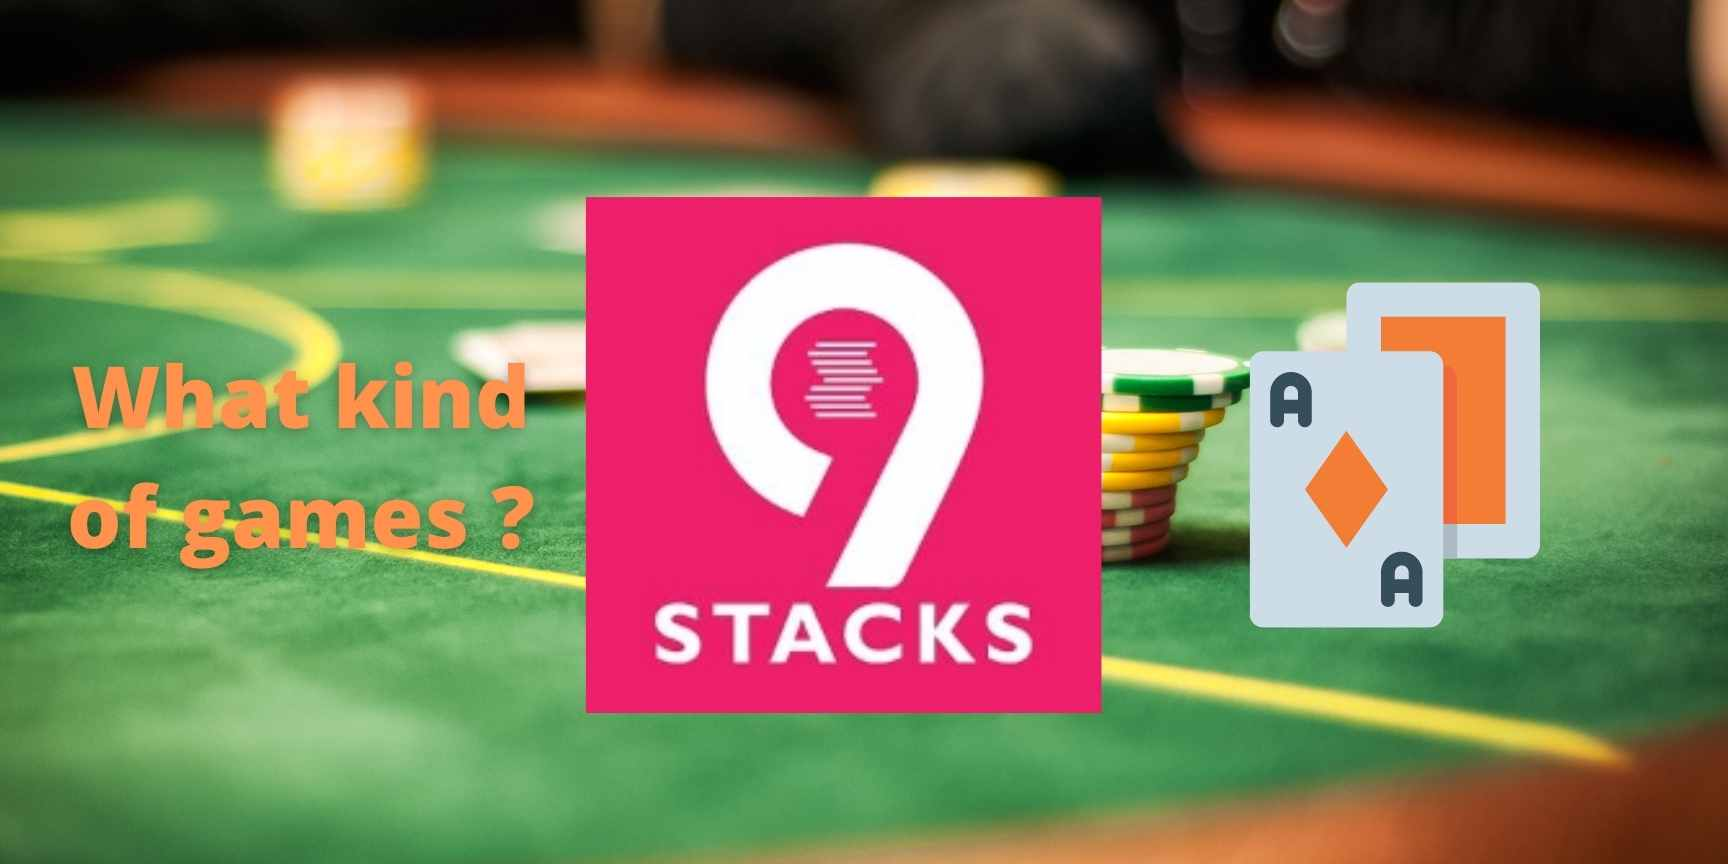 9stacks games